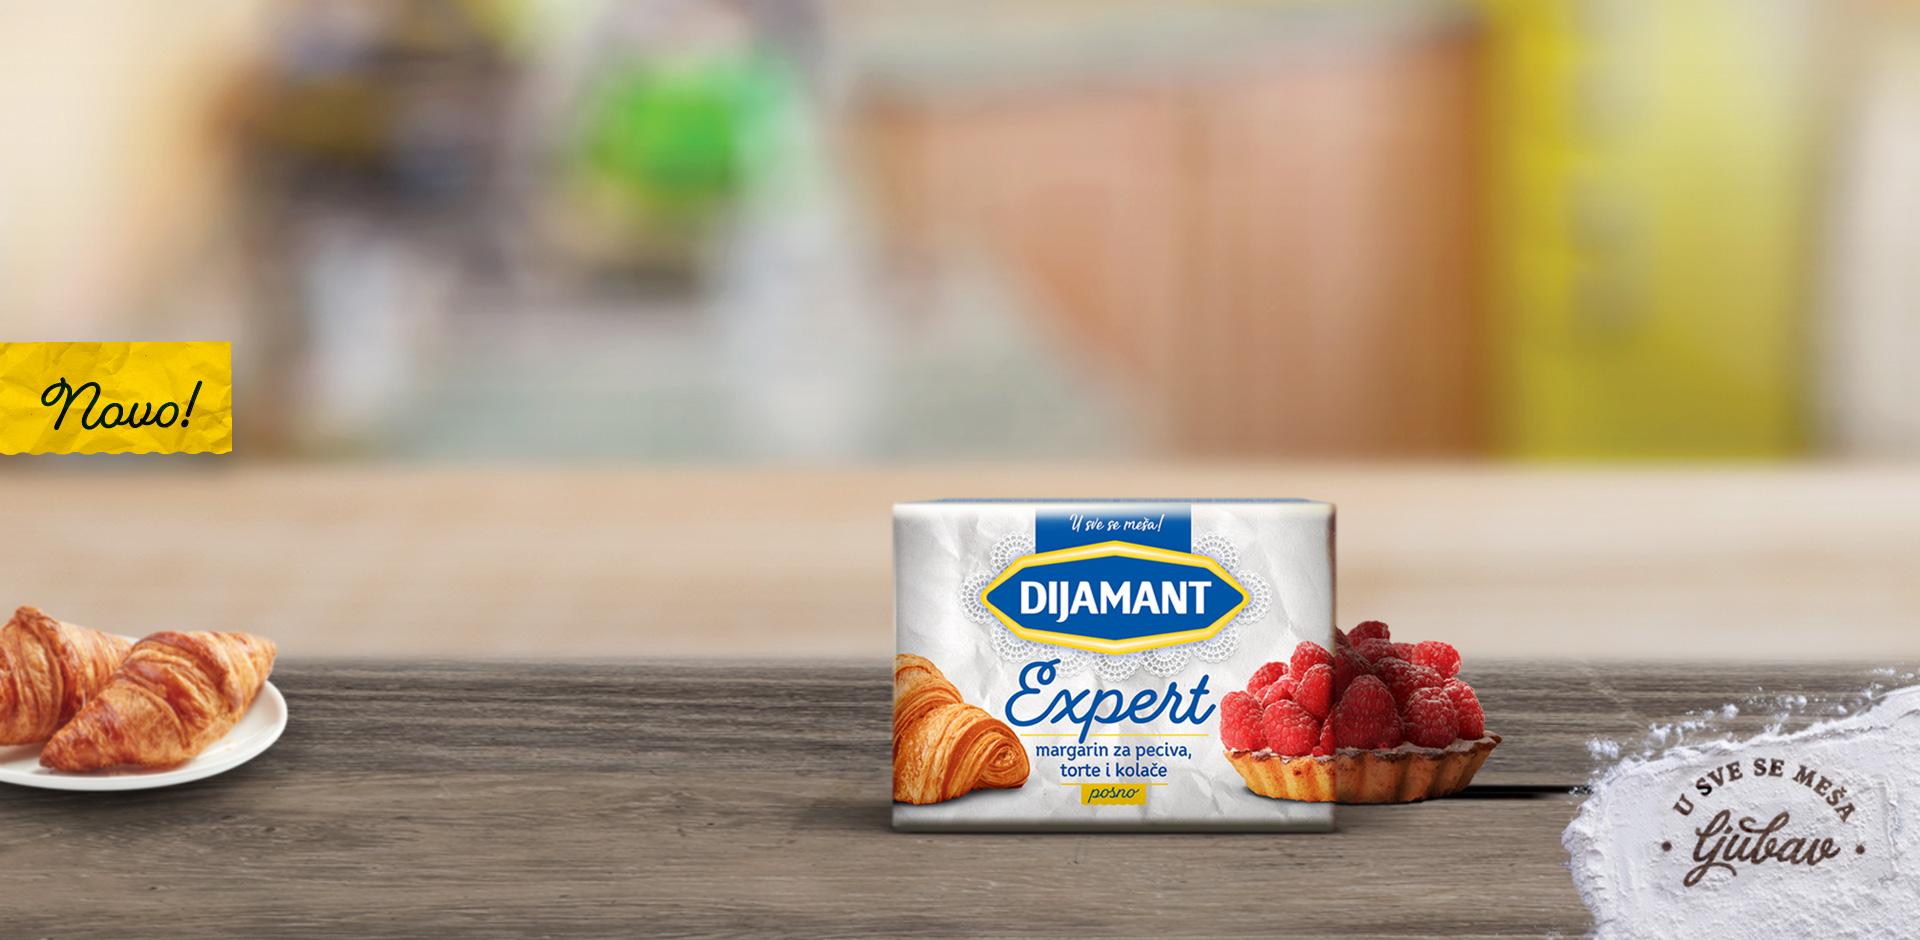 Dijamant-slider-2018-expert-margarin